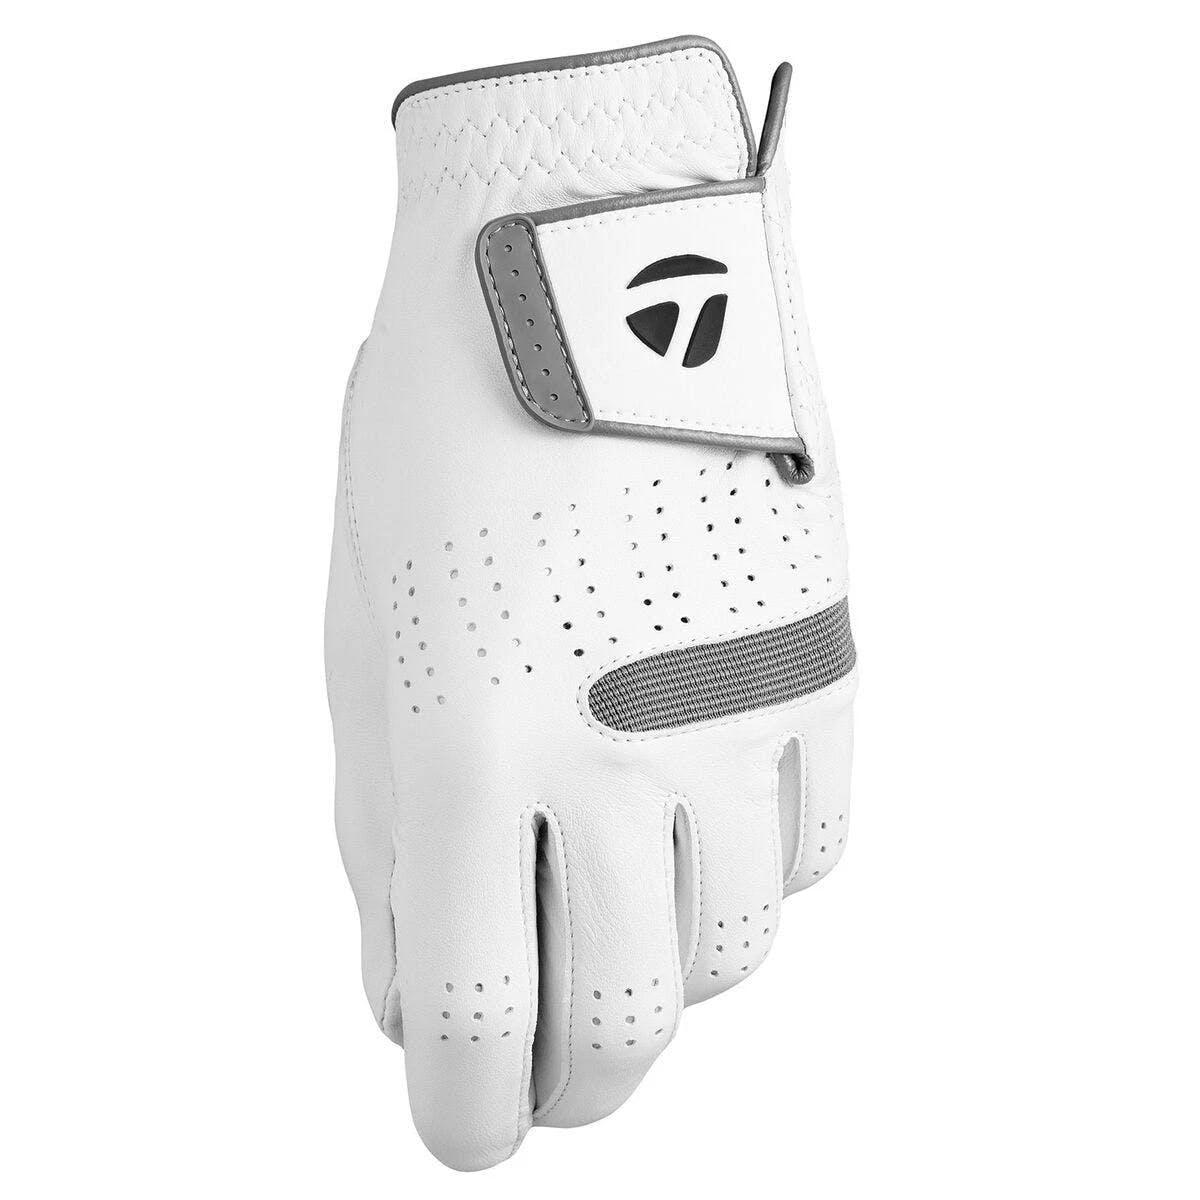 TaylorMade Tour Preferred Flex Cadet Glove White